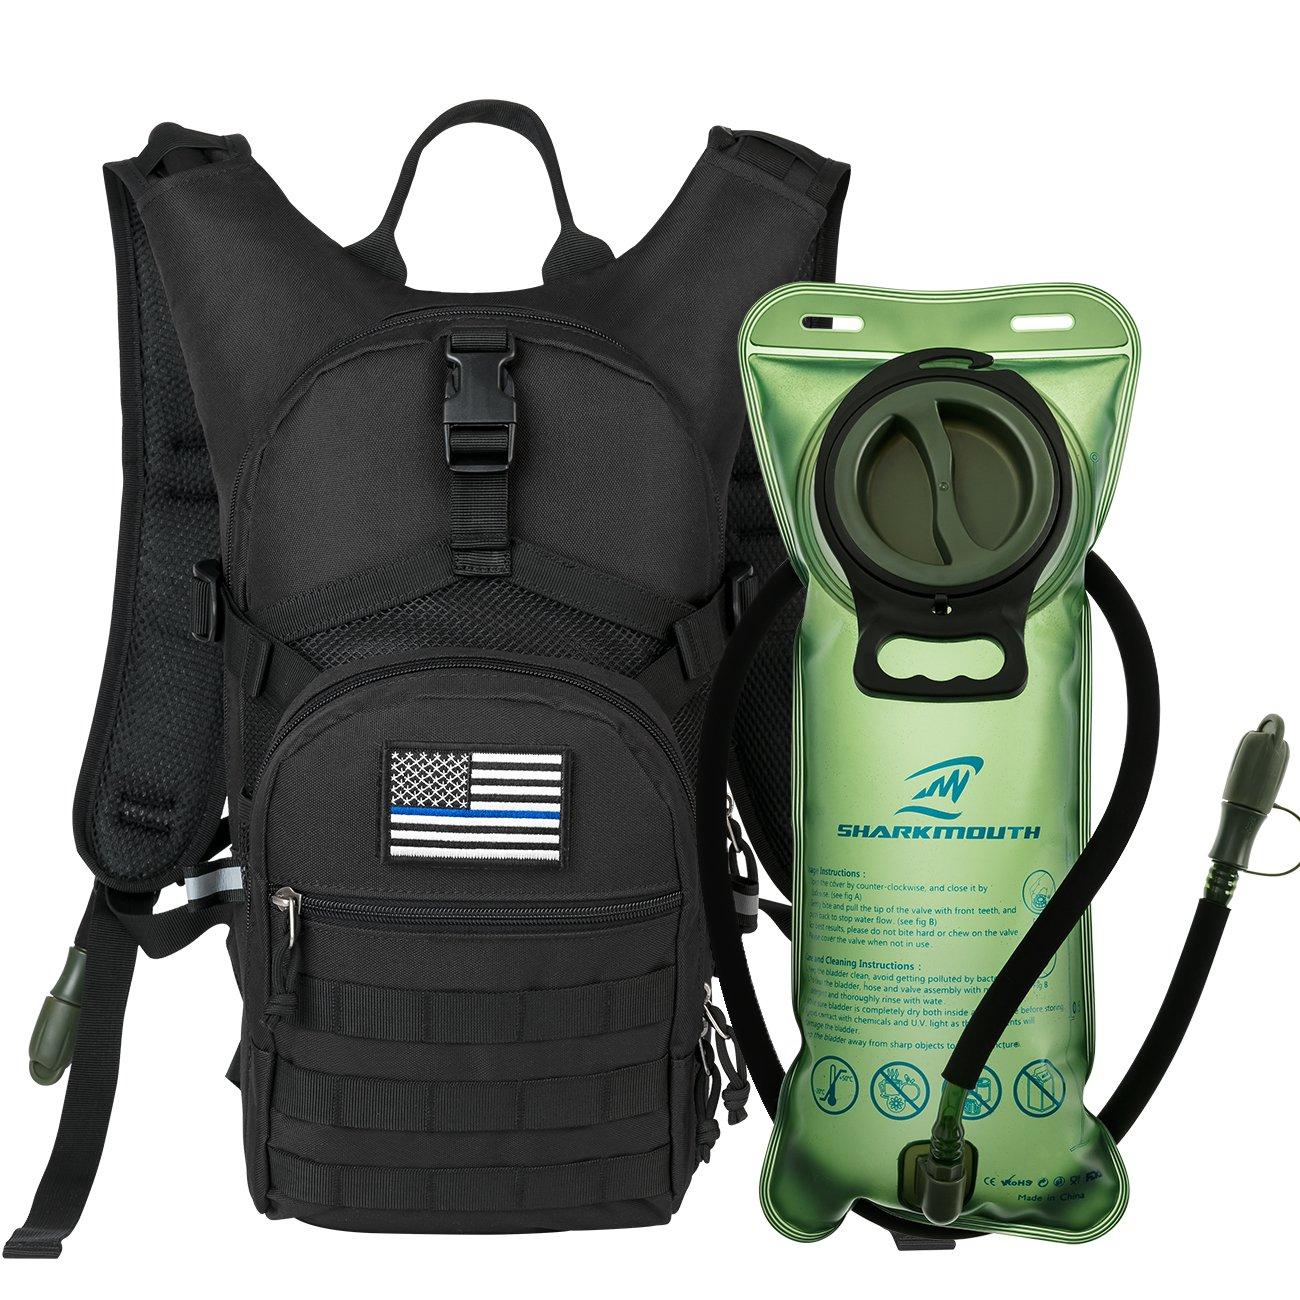 SHARKMOUTH 2L Leak-Proof Water Bladder Hydration Backpack